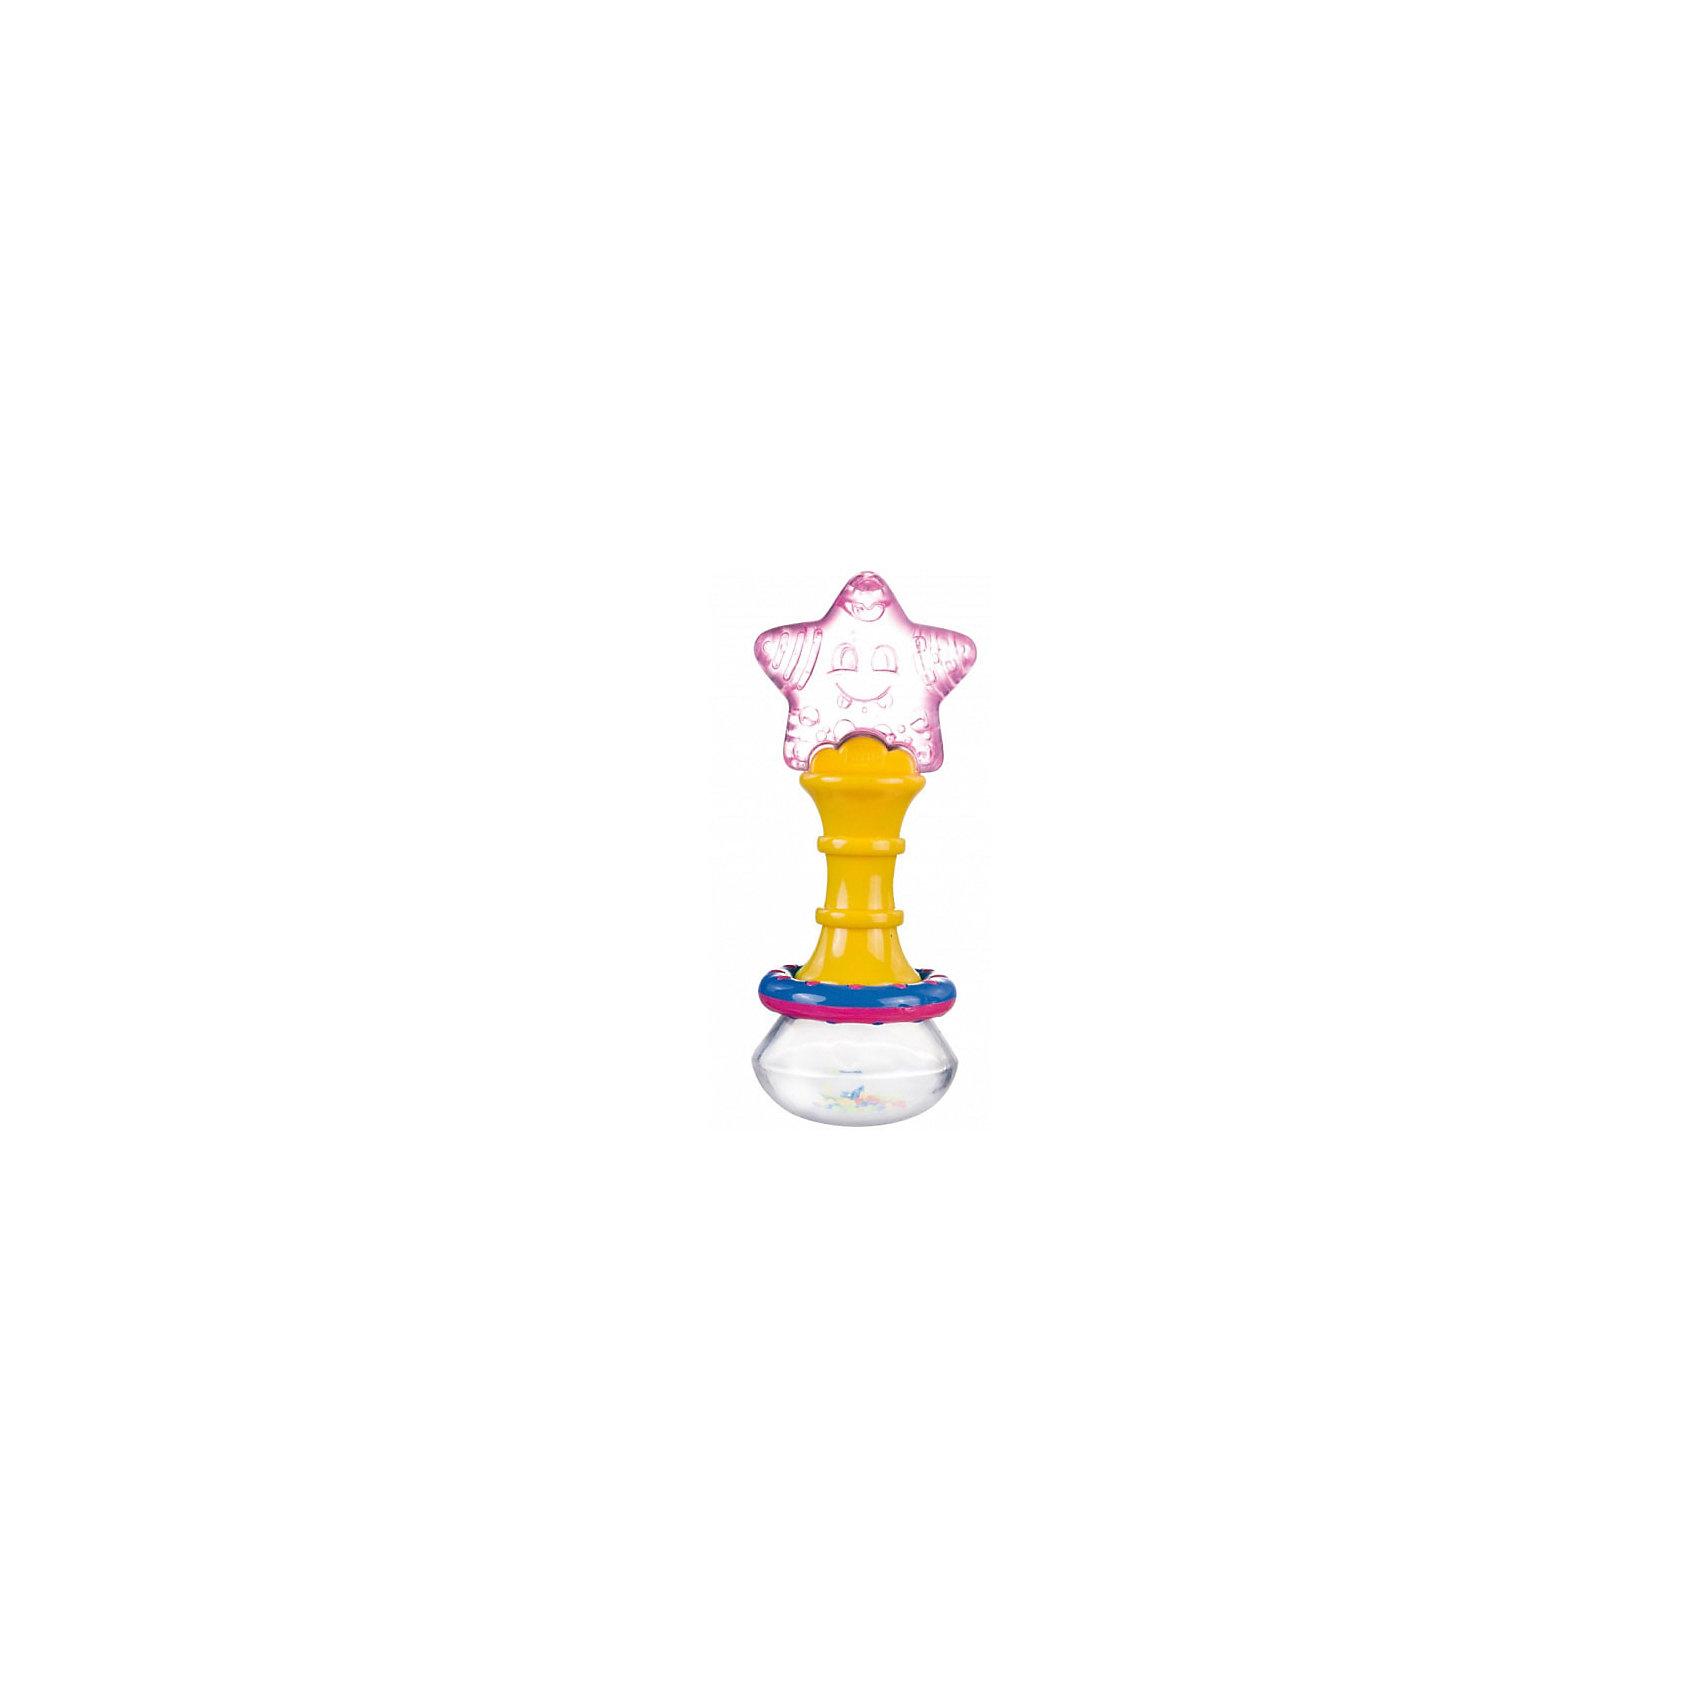 Погремушка, Canpol Babies, желто-розовая